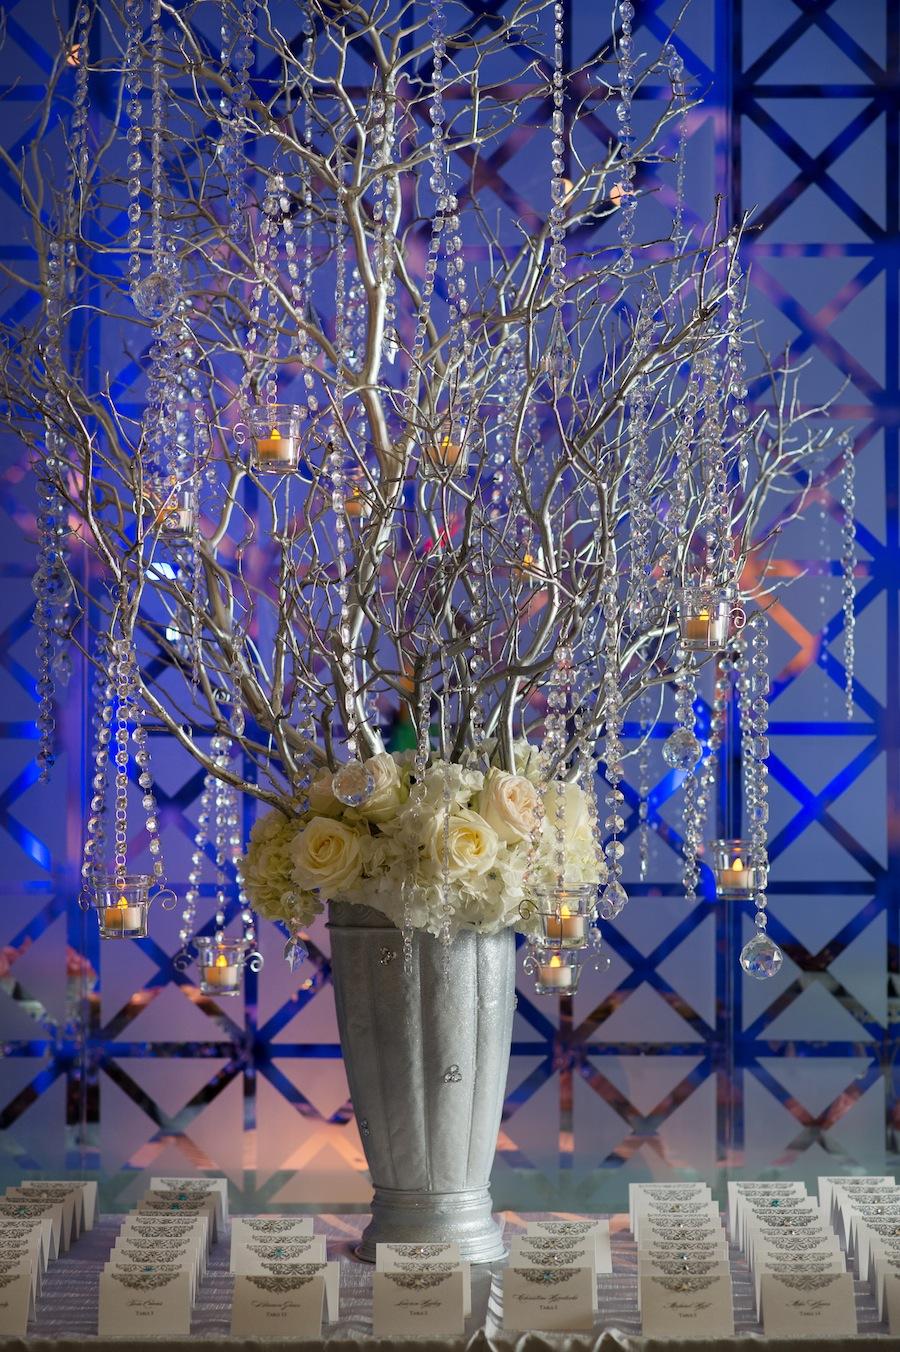 Tree wiht Dripping Rhinestones Wedding Decor by Apple Blossoms Floral Design